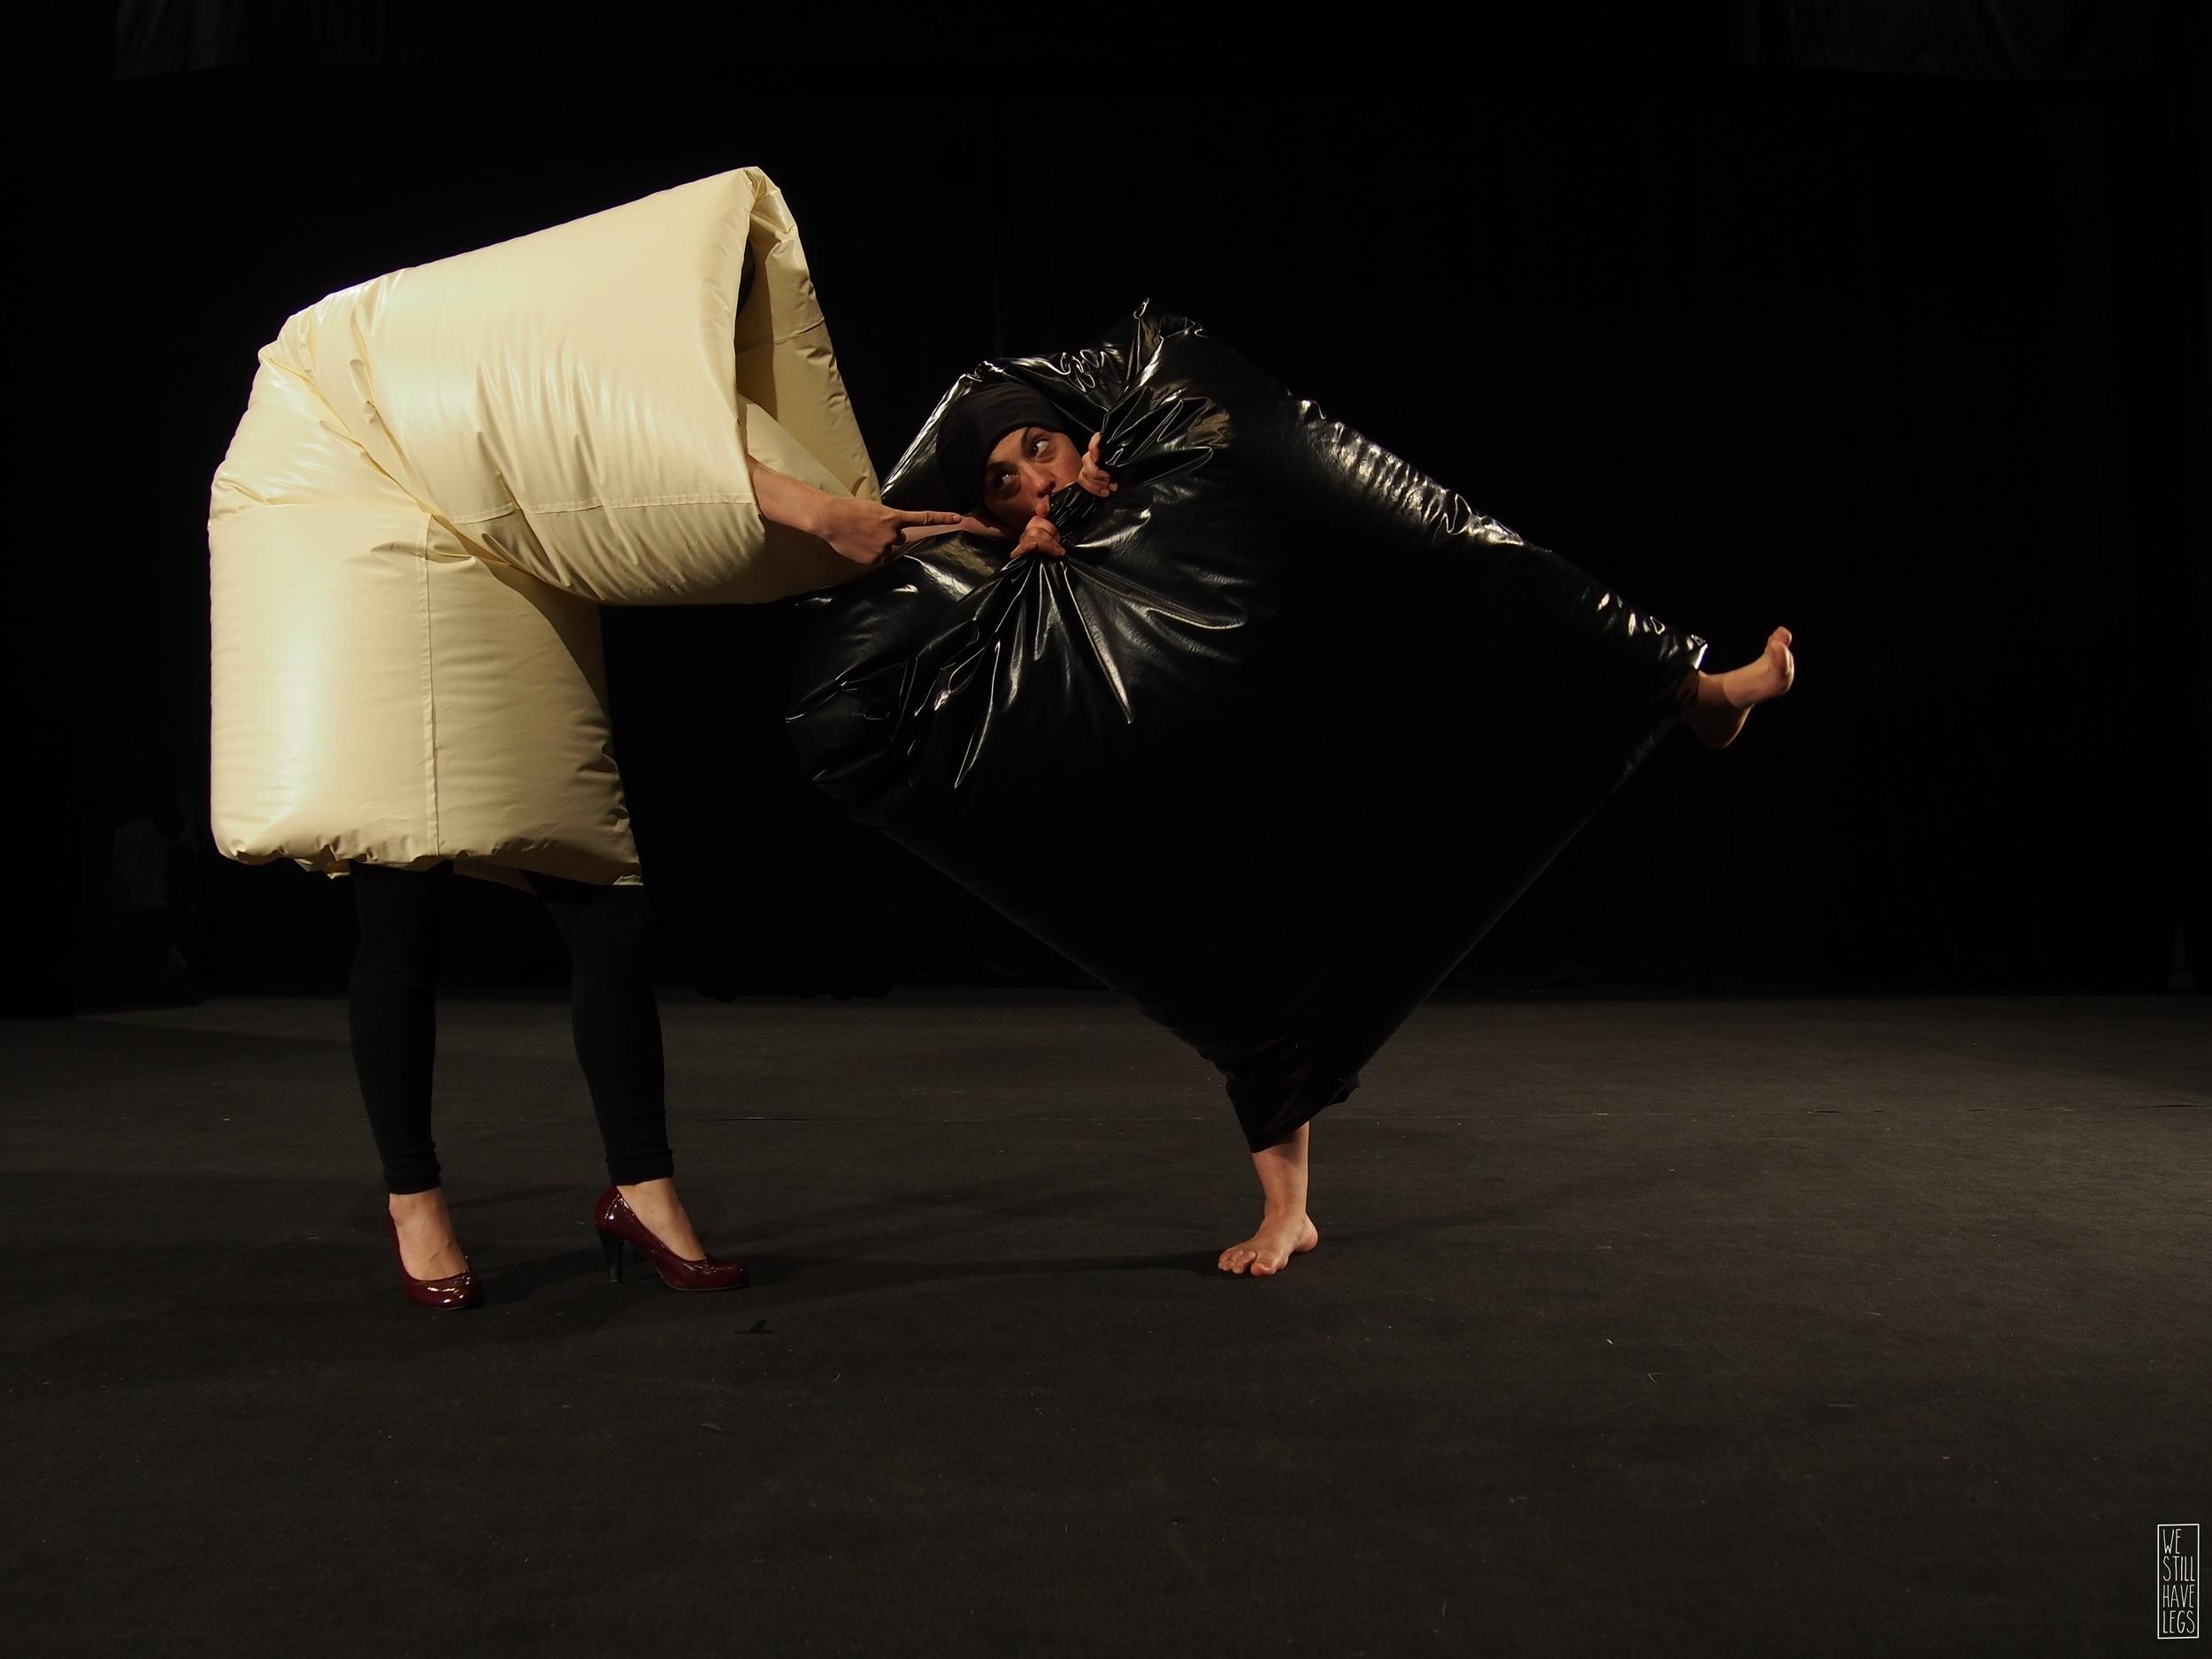 By Alexandra Brunet - We Still Have Legs